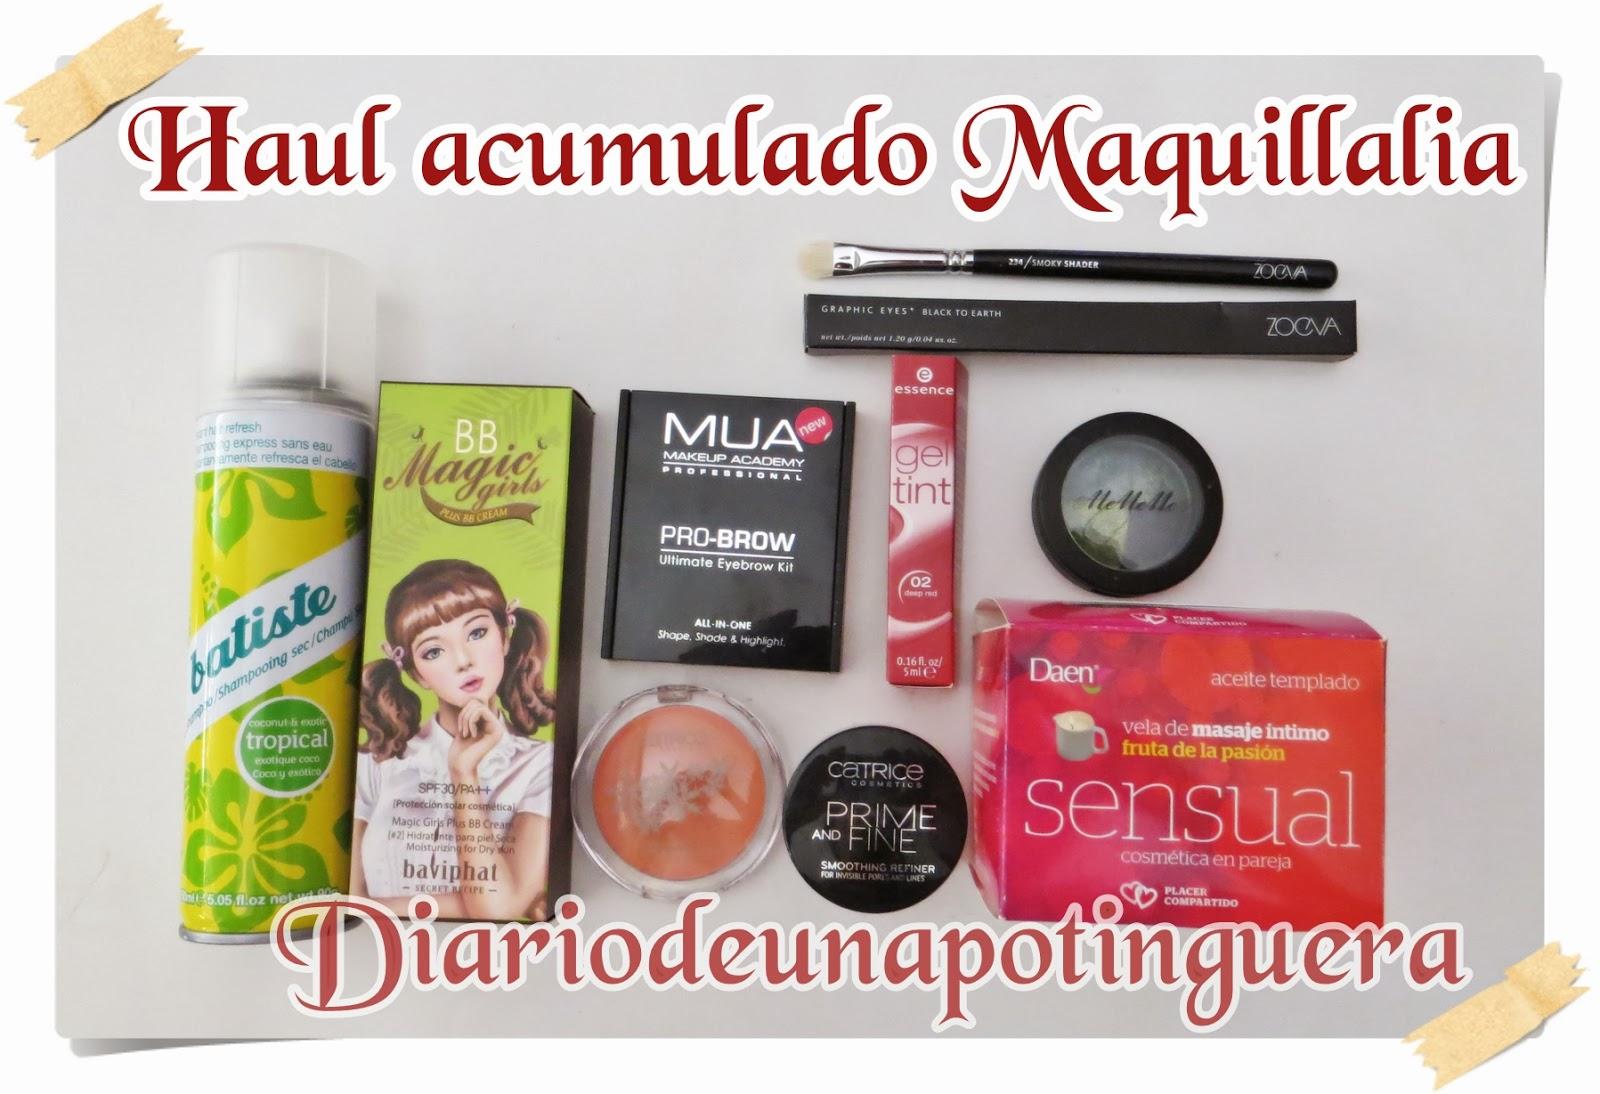 http://diariodeunapotinguera.blogspot.com.es/2014/01/haul-acumulado-maquillalia.html